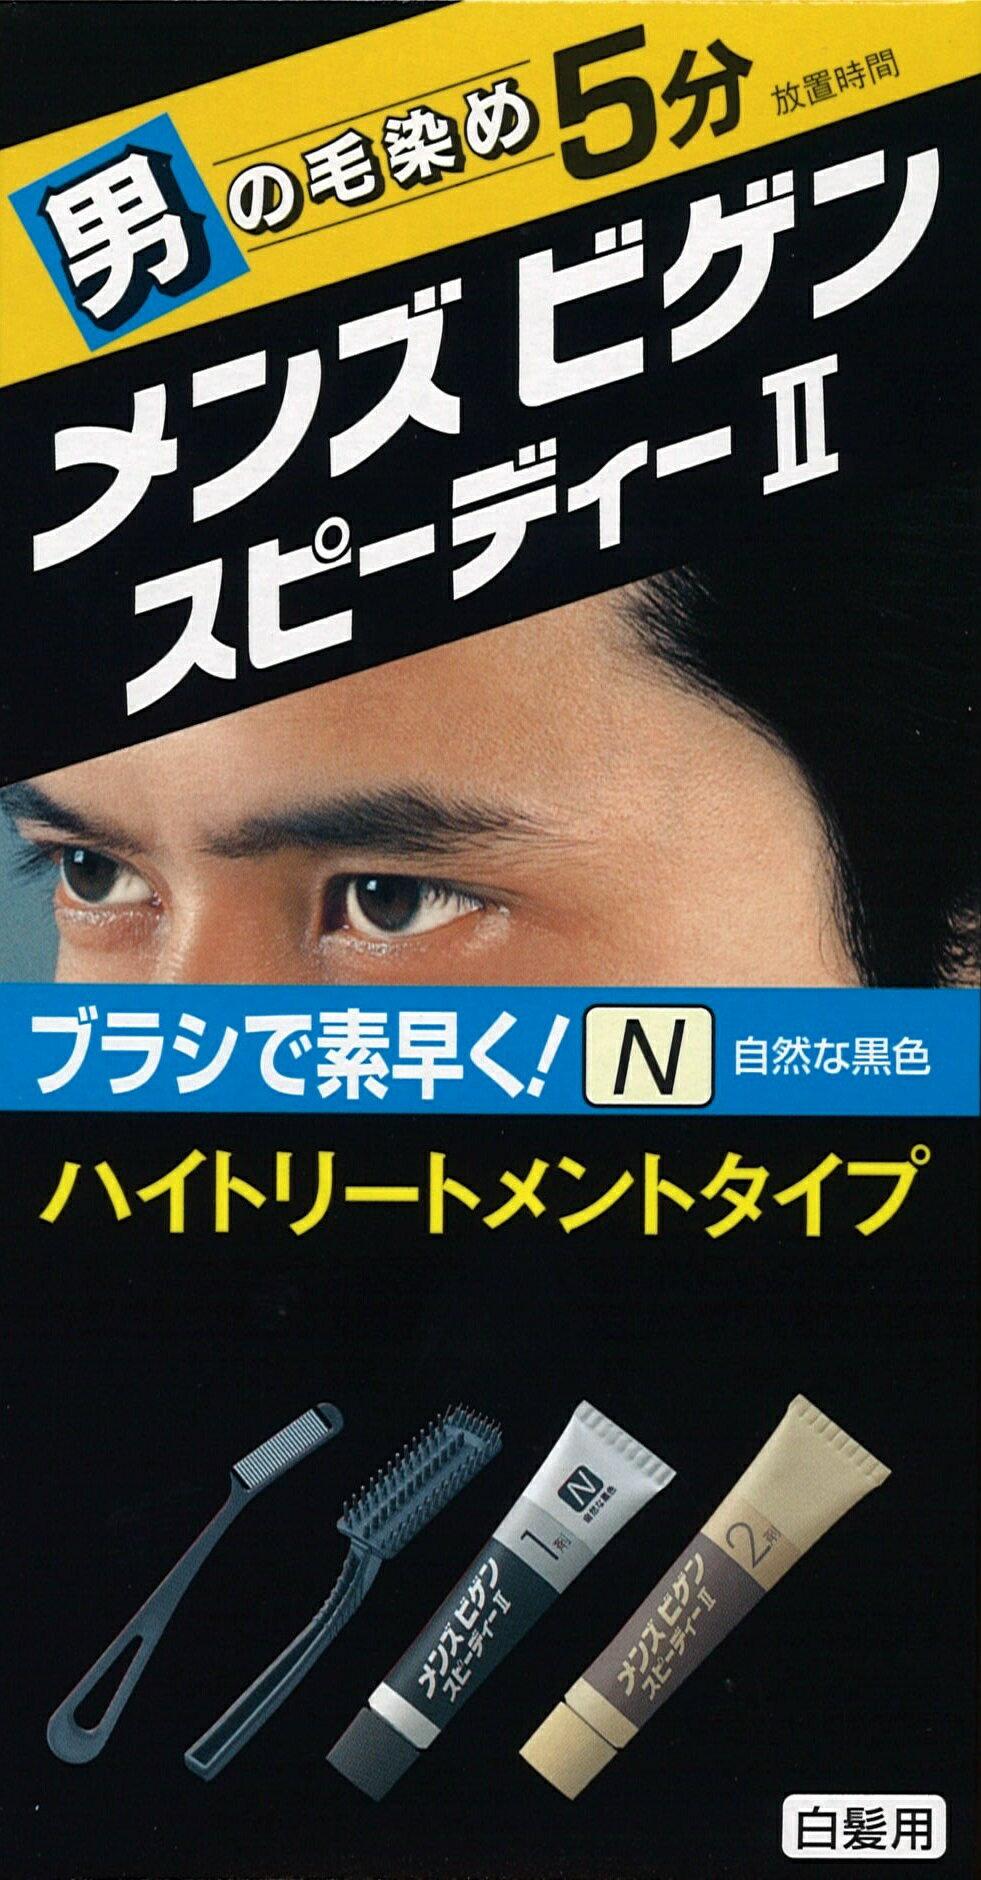 Men's Bigen美源男士 彩絲快速染髮霜【N】自然黑色 - 限時優惠好康折扣